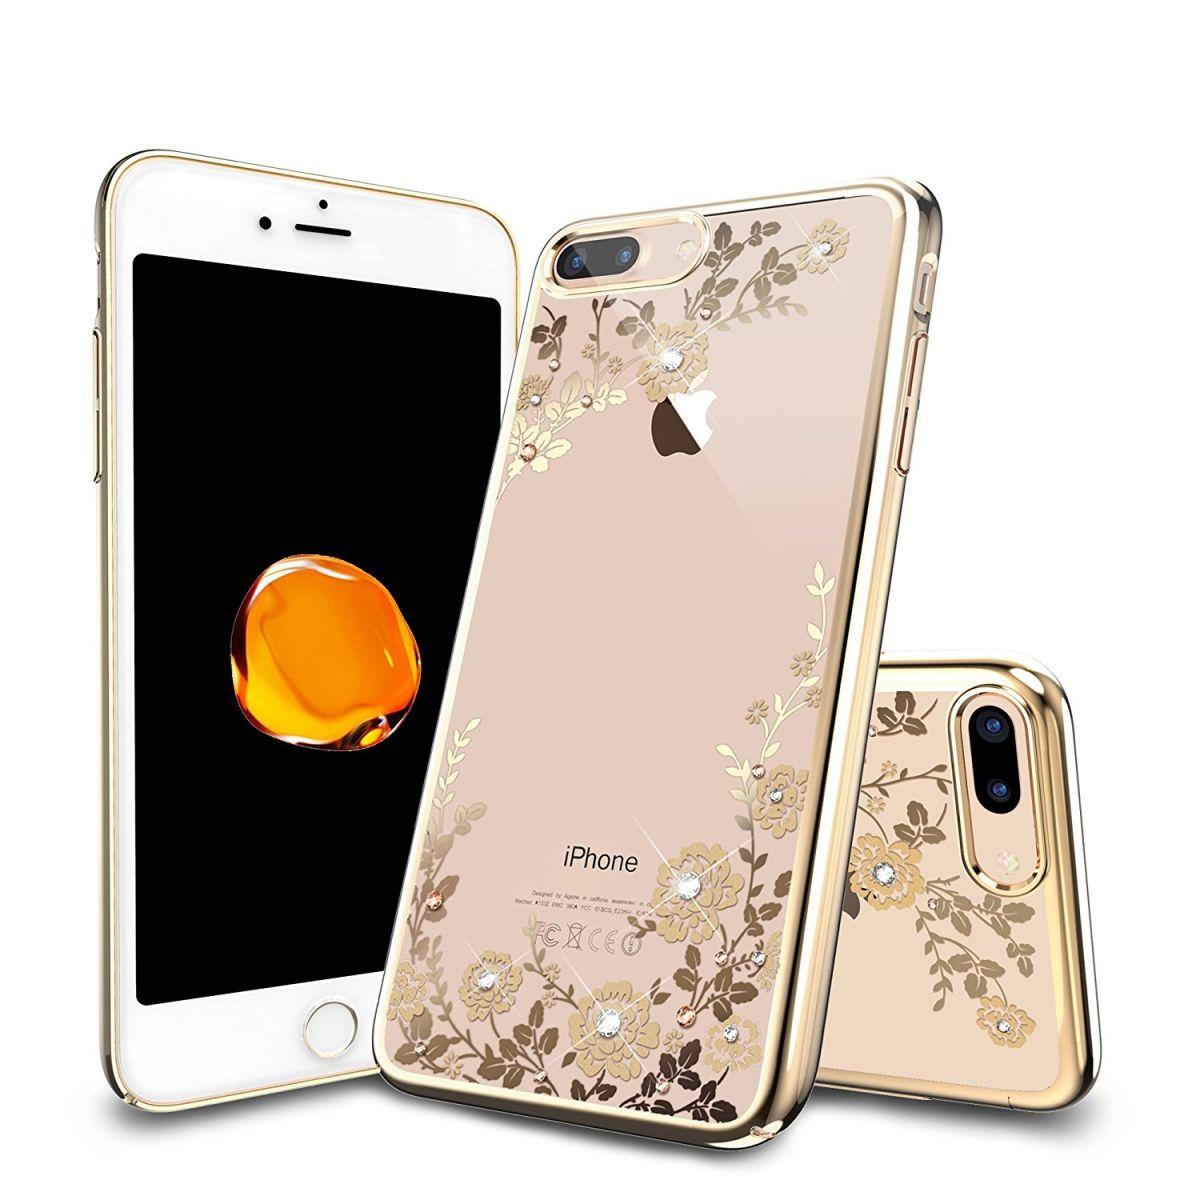 Obal / kryt Crystal Flowers pro iPhone 7 Plus - Zlatý (gold)